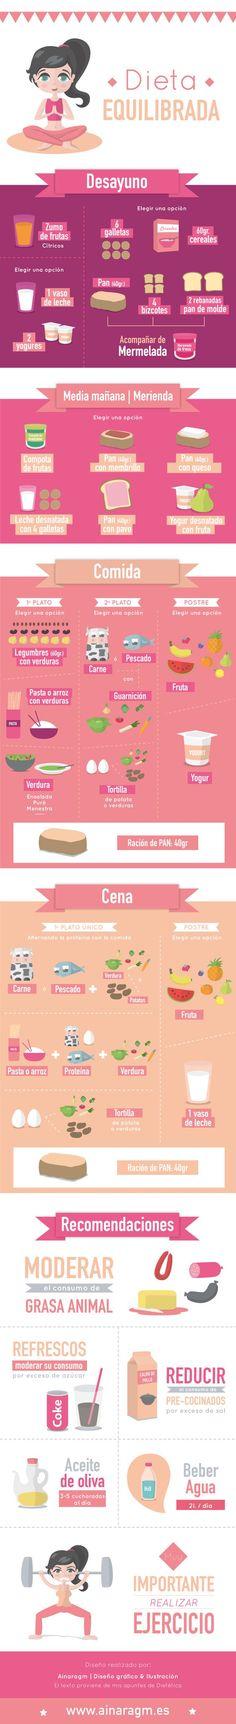 infografia una dieta equilibrada: